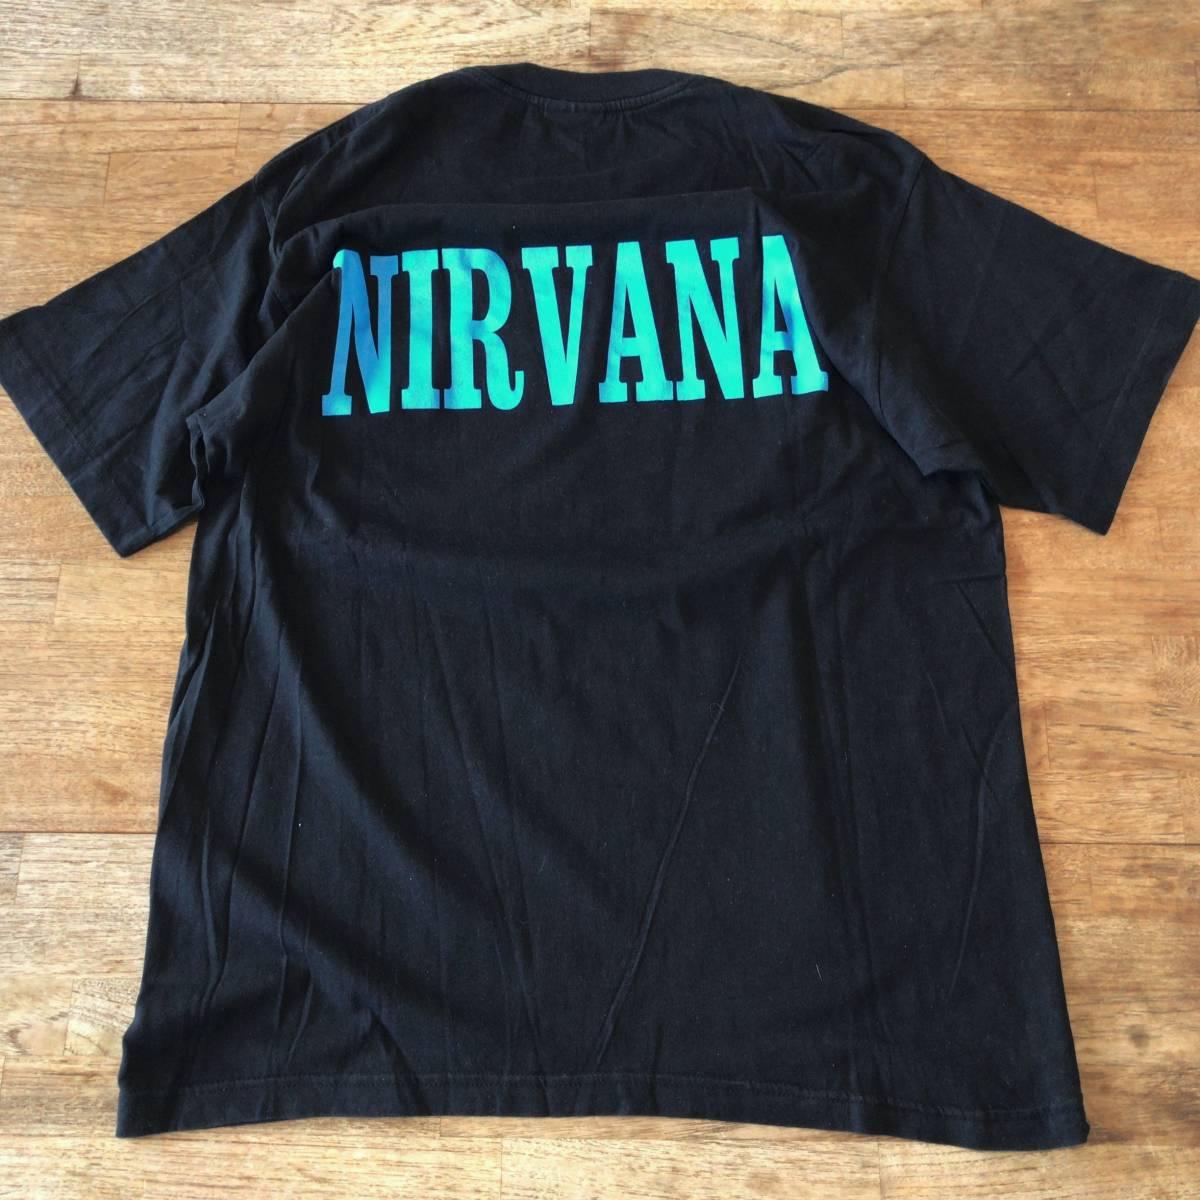 90s カートコバーン ビンテージ Tシャツ 追悼 nirvana ニルヴァーナ ニルバーナ レア バンドT ロックT kurt cobain vintage_画像5